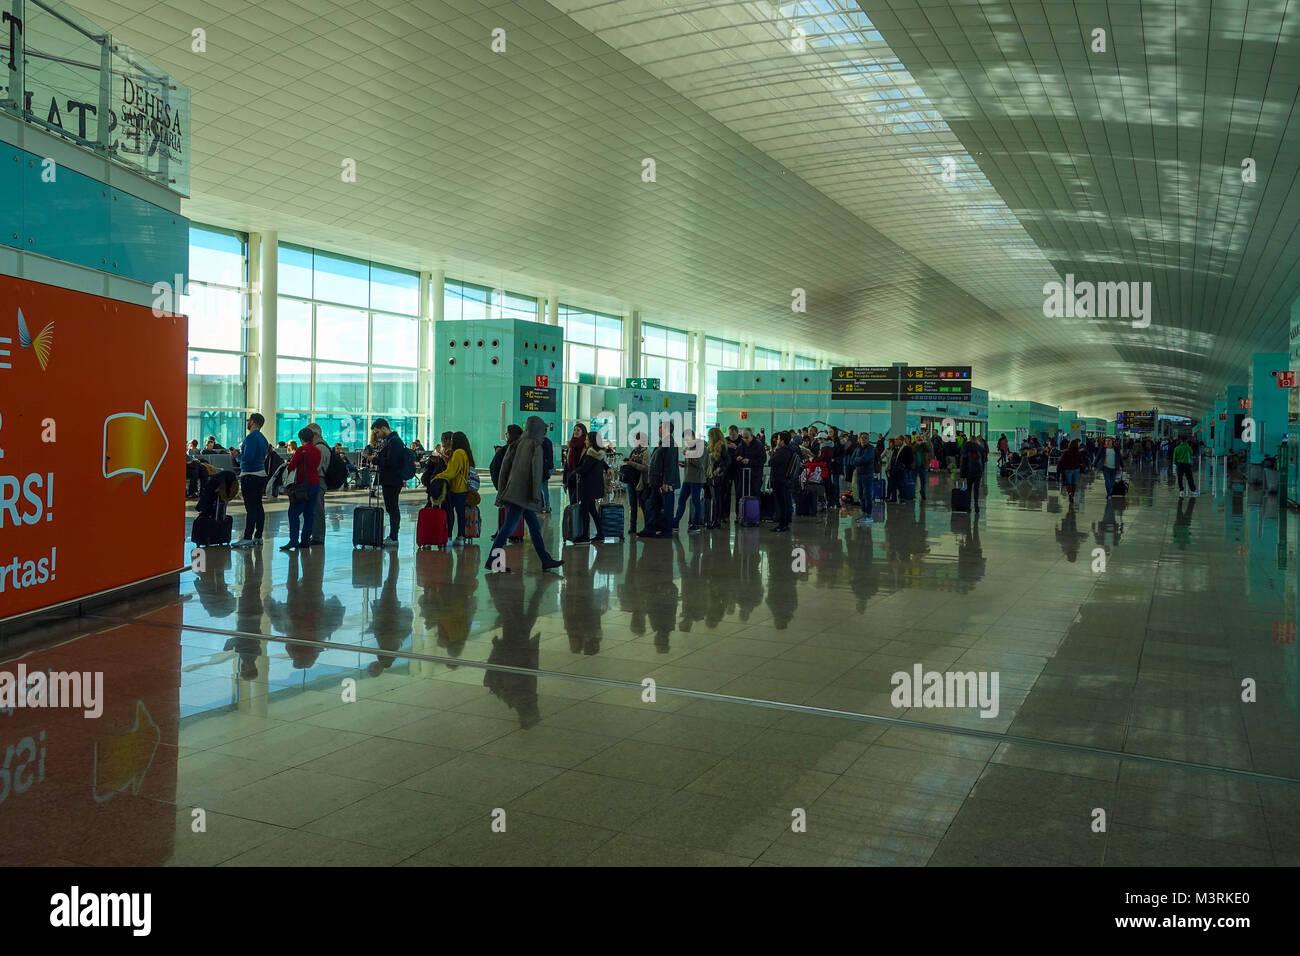 Barcelona El Prat airport with people queueing Stock Photo